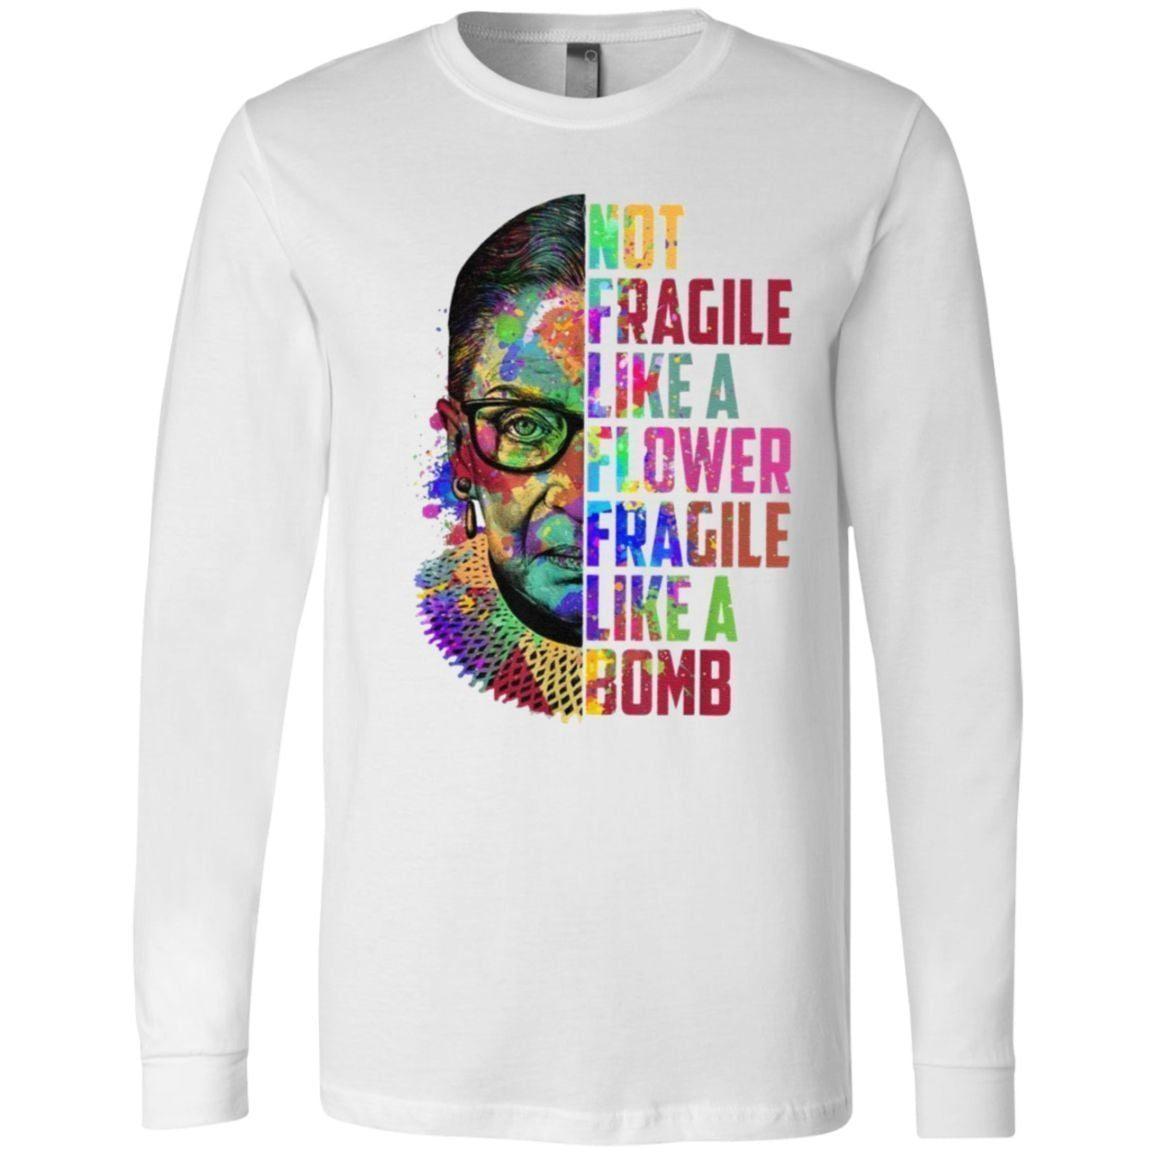 rbg shirt not fragile like a flower fragile like a bomb t shirt